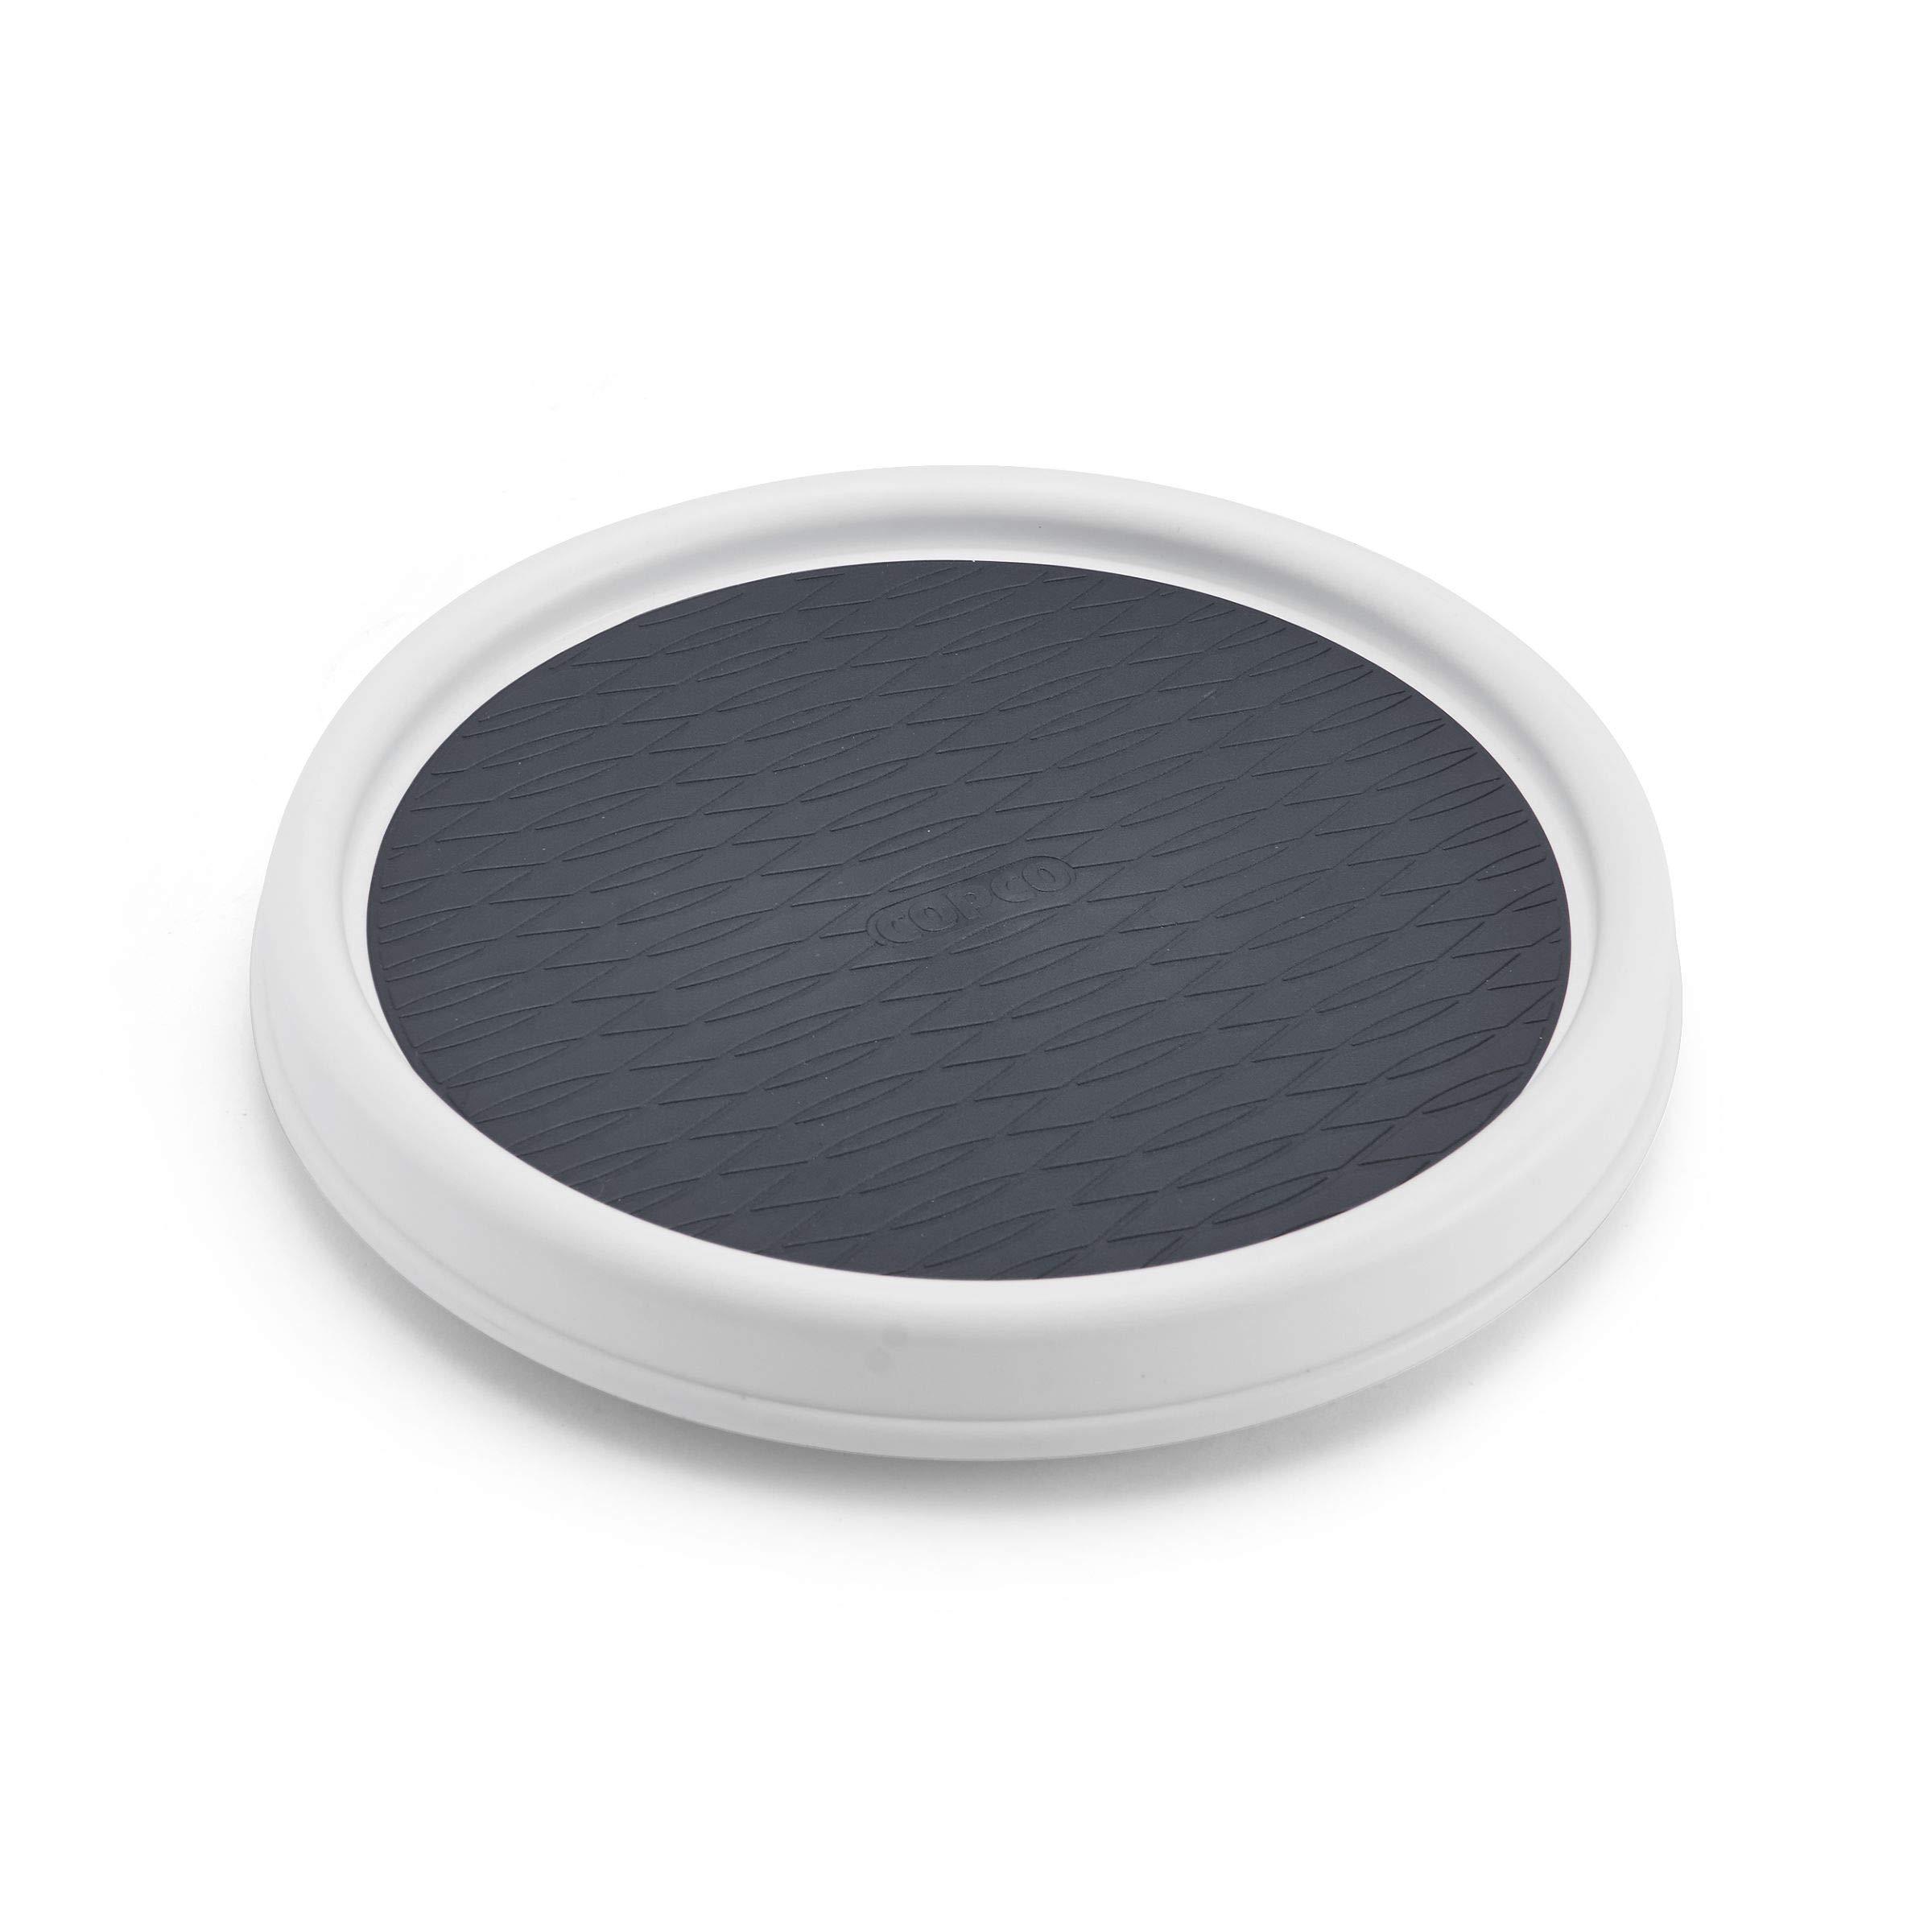 Copco Non-Skid Pantry Cabinet, 9-Inch, White/Gray